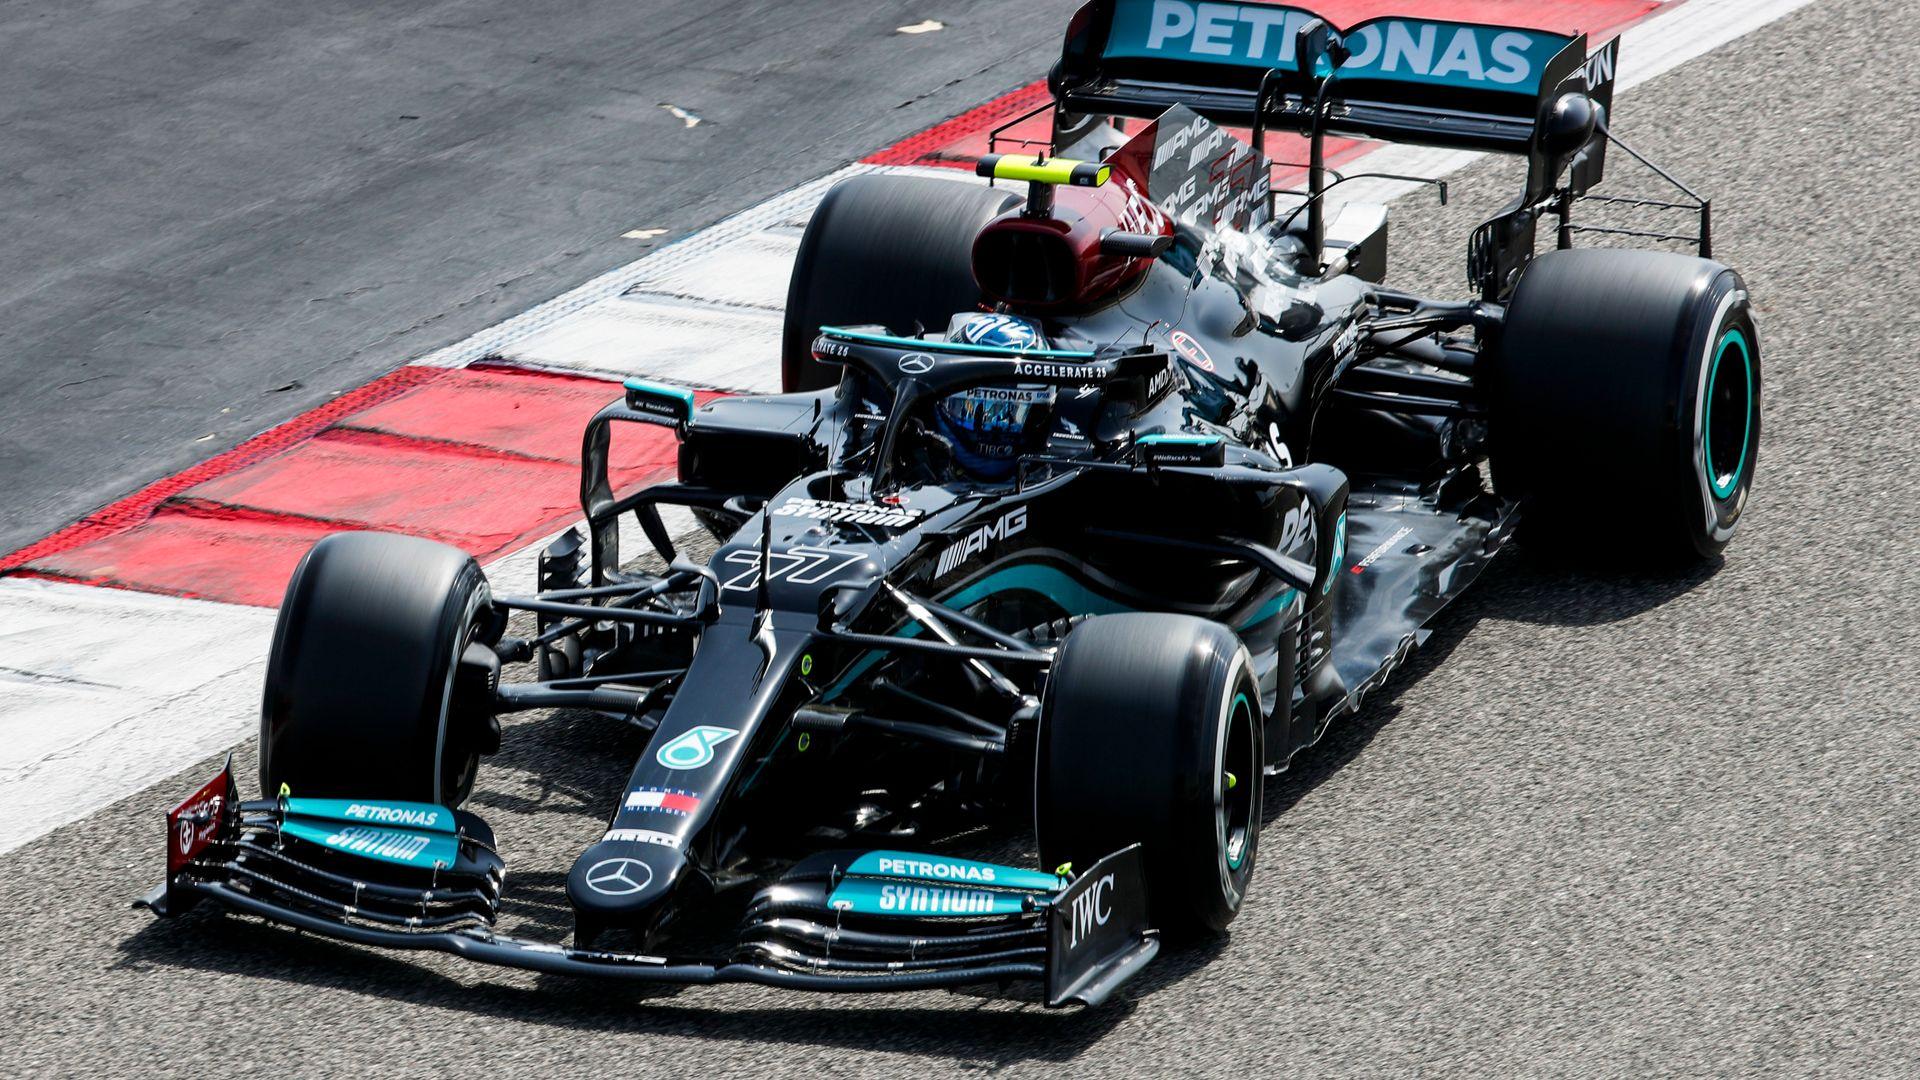 Mercedes hit problems, Ricciardo ahead to start F1 2021